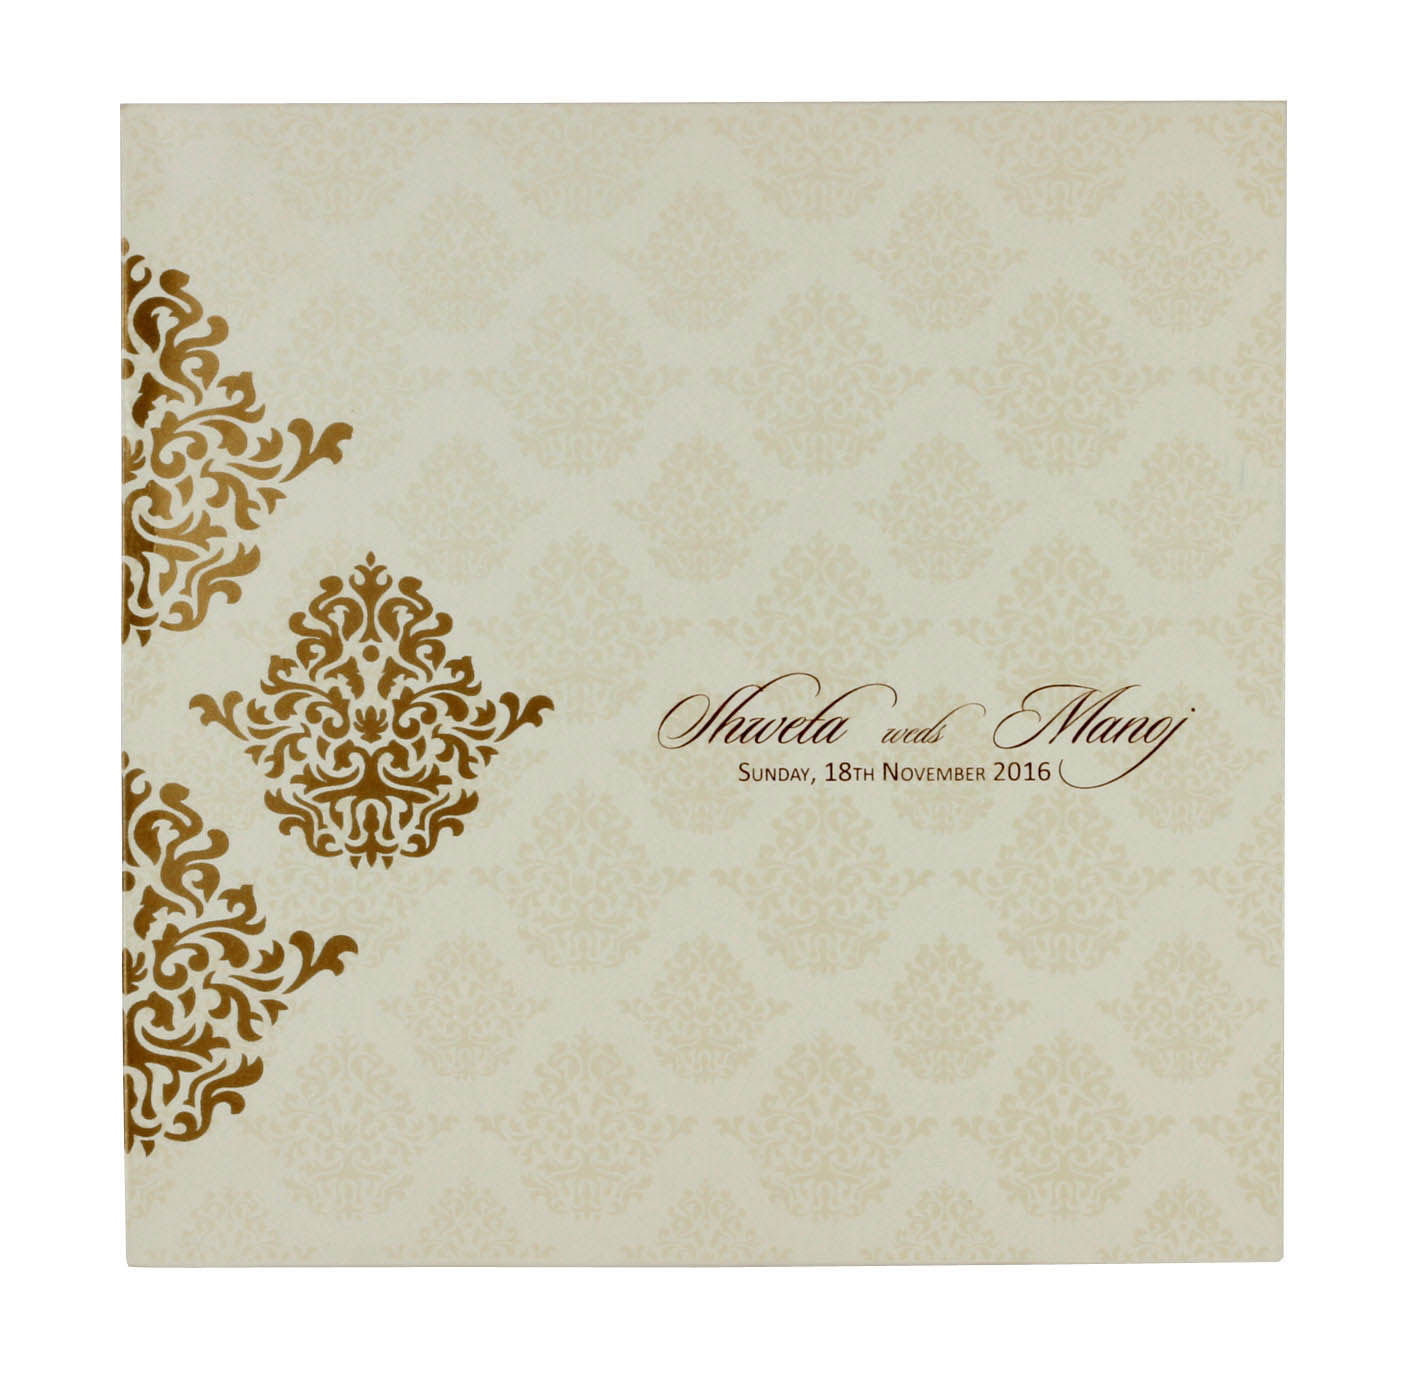 Multifaith ivory colour wedding invitation with golden motifs